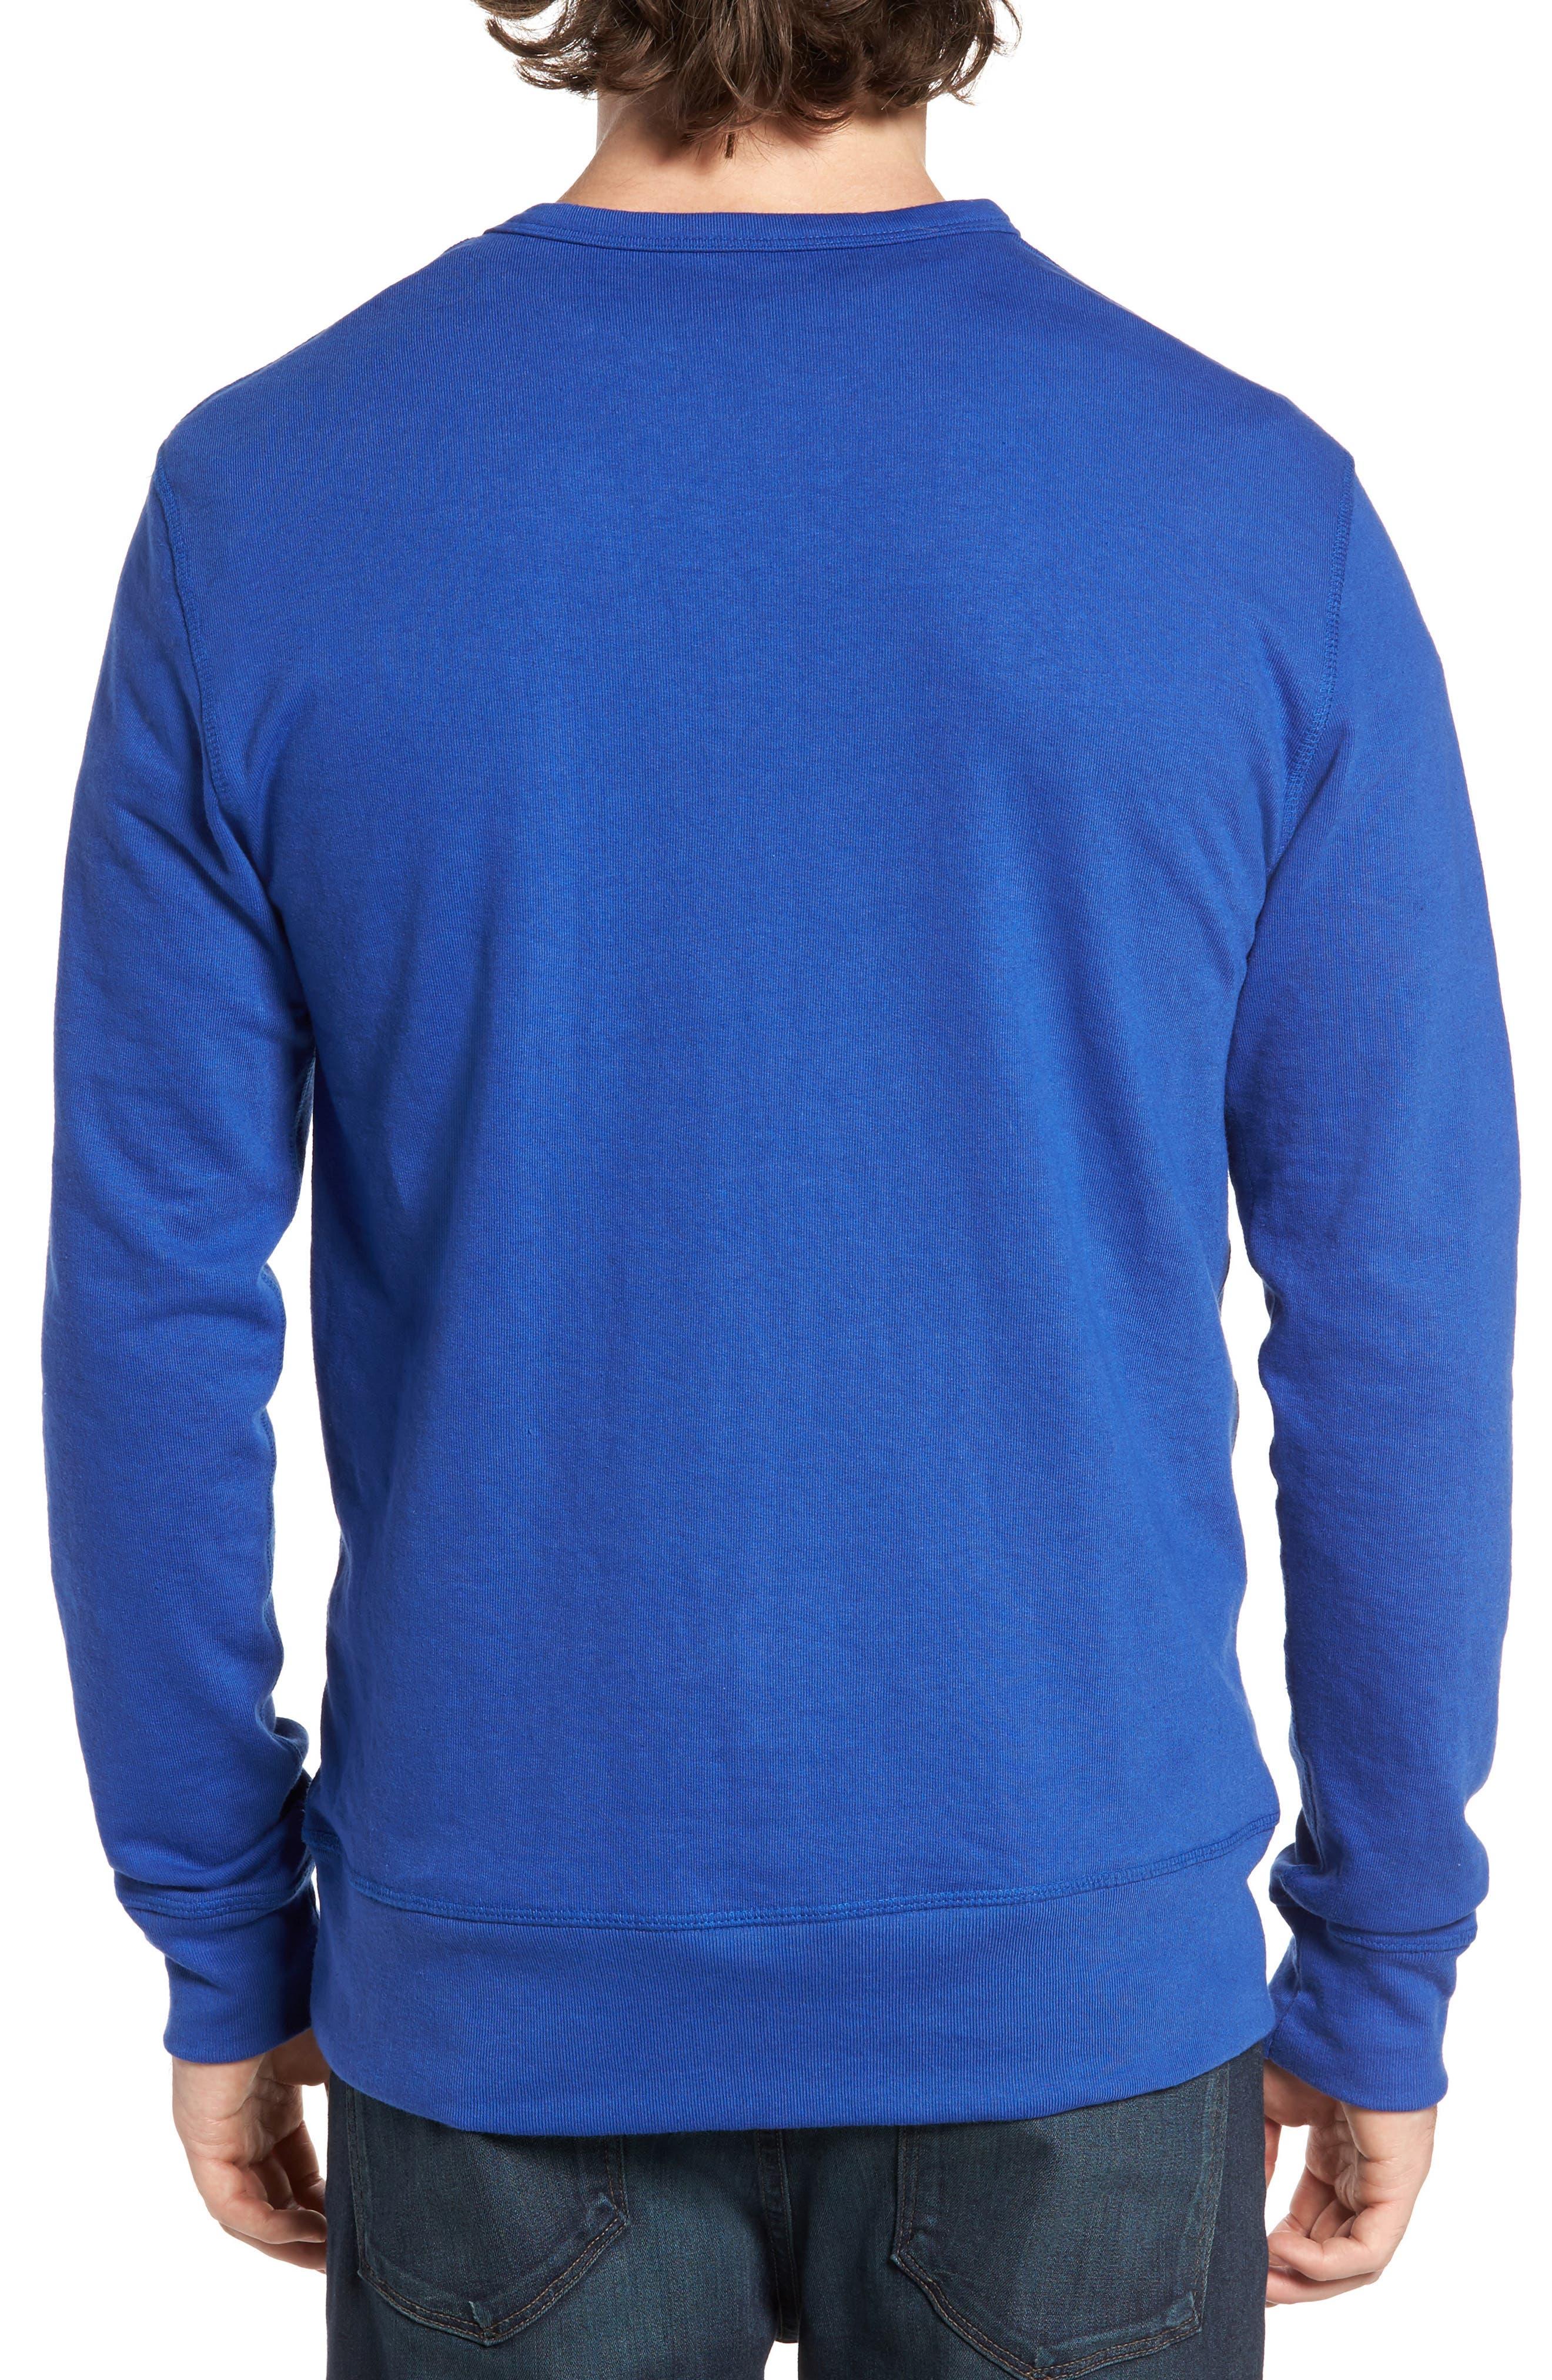 B-Side Reversible Crewneck Sweatshirt,                             Alternate thumbnail 13, color,